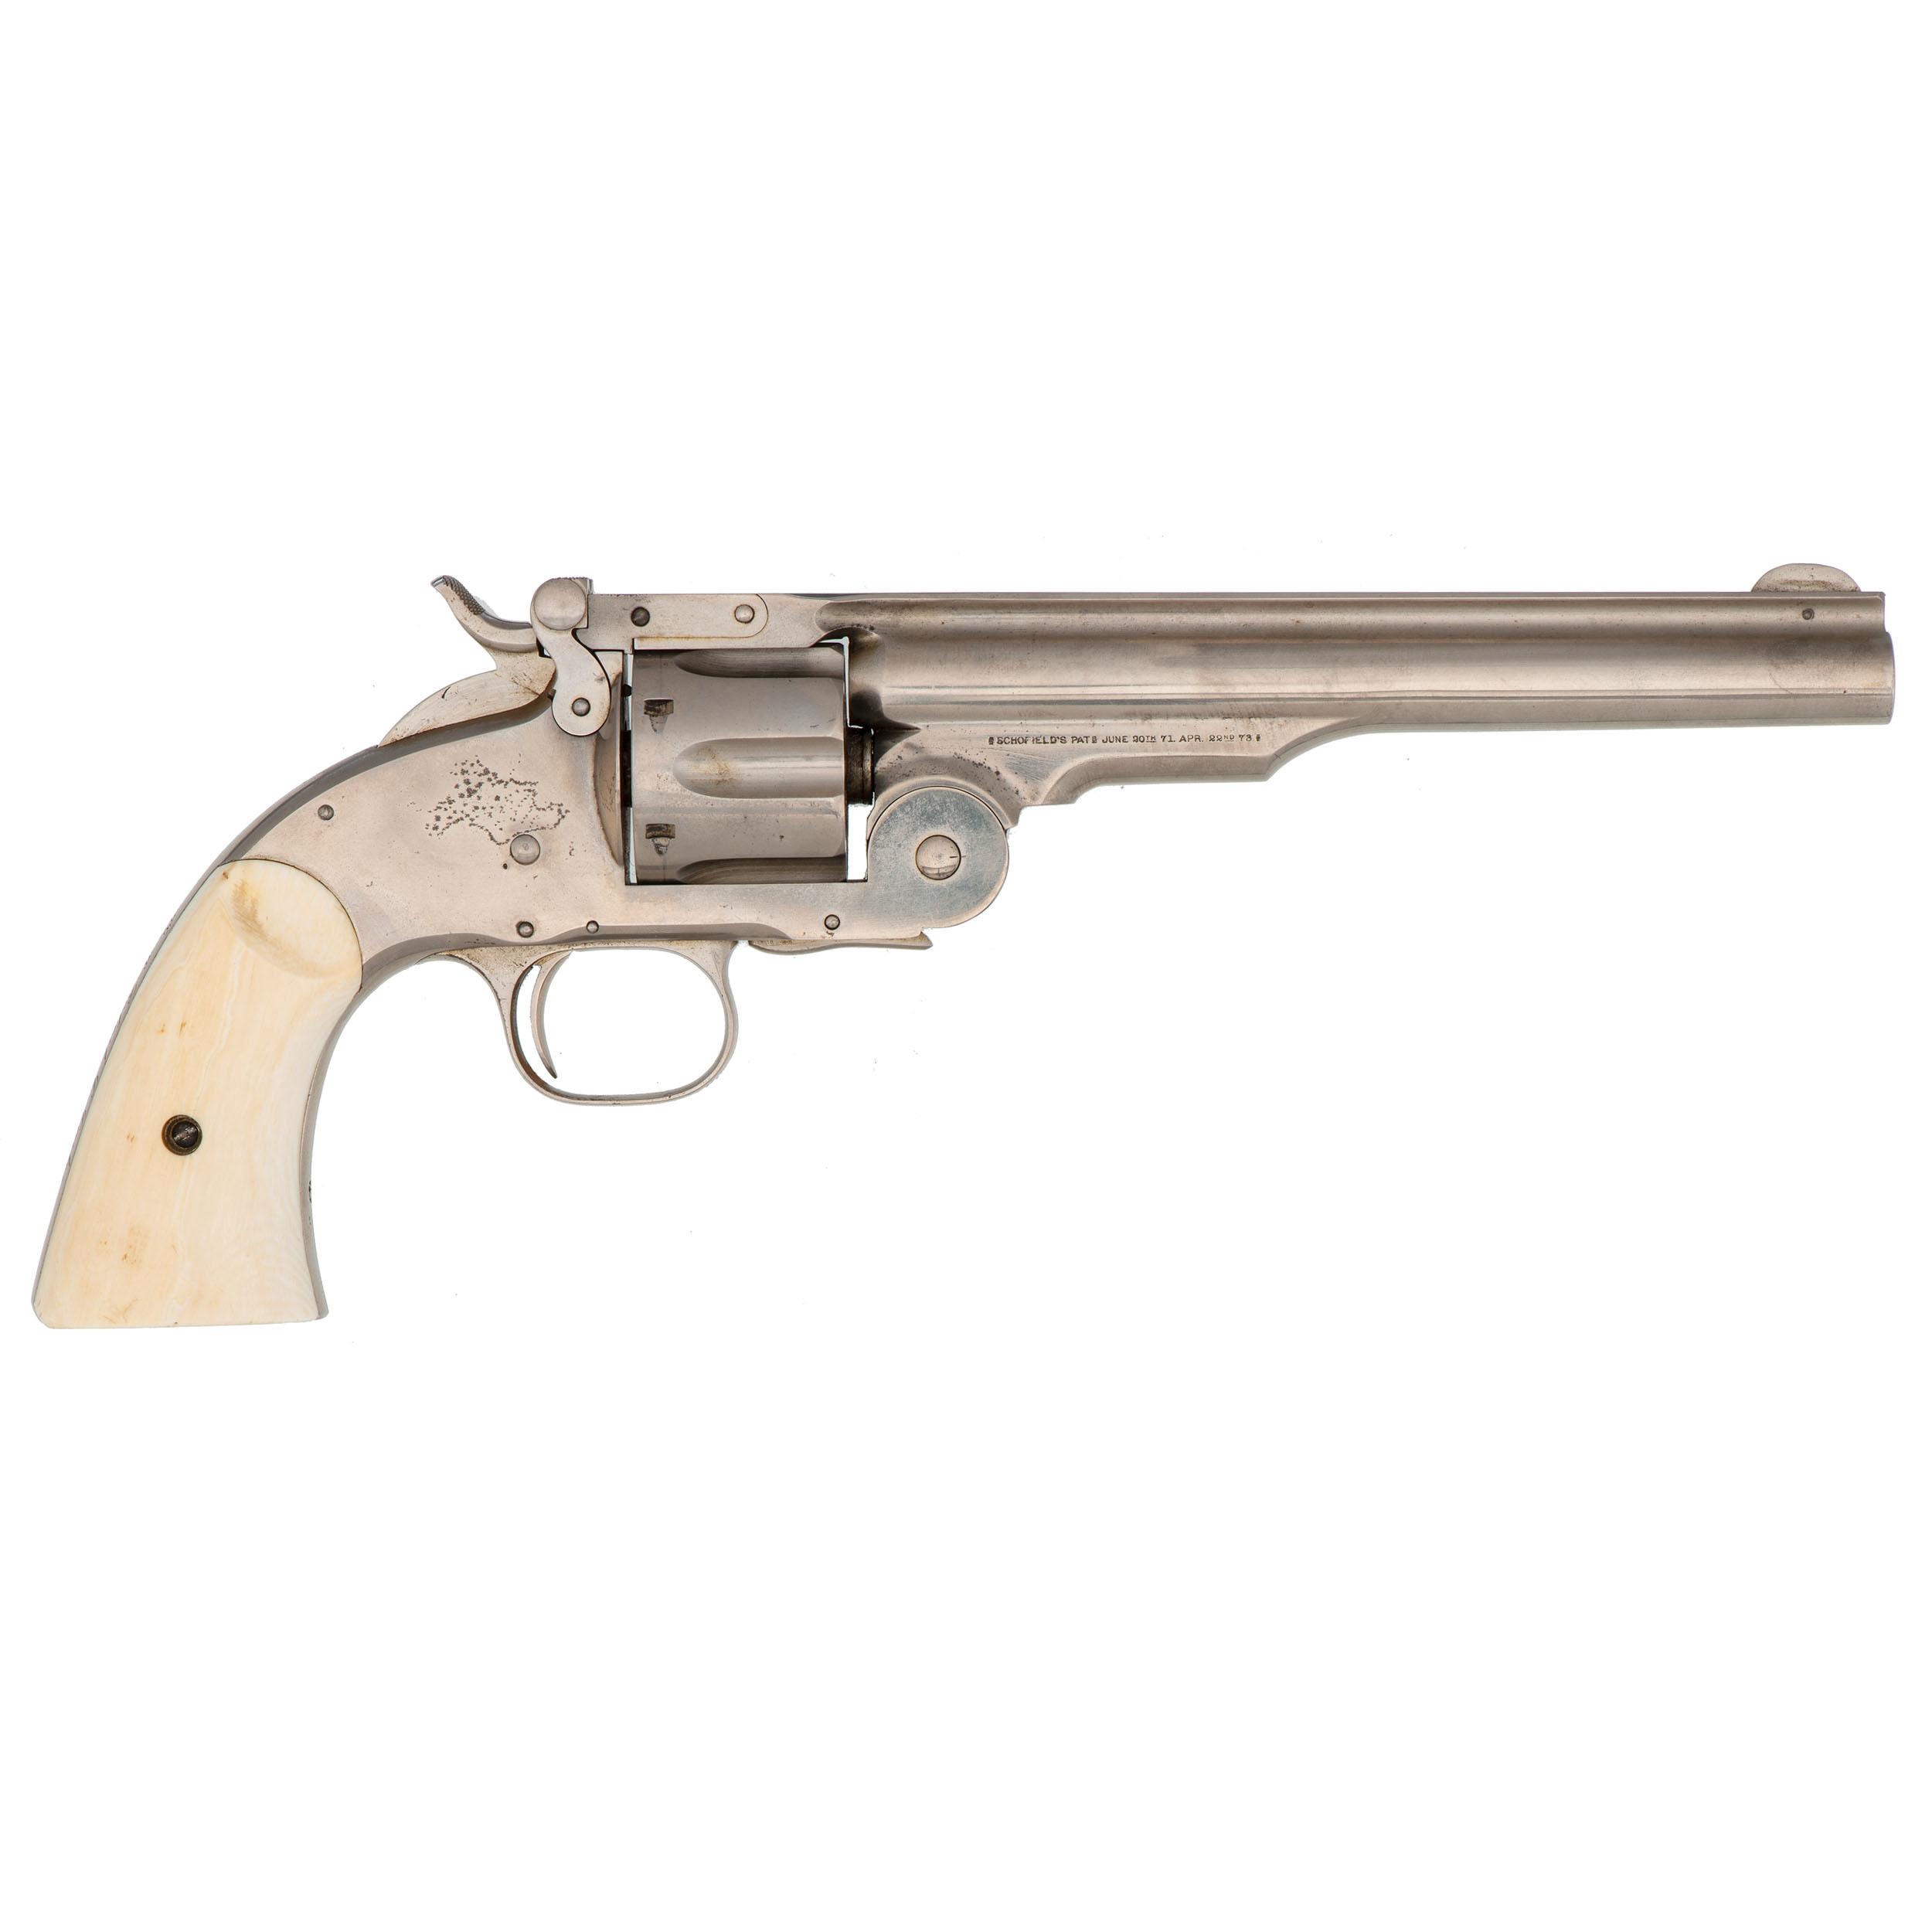 Smith & Wesson Second Model Schofield Revolver Presented